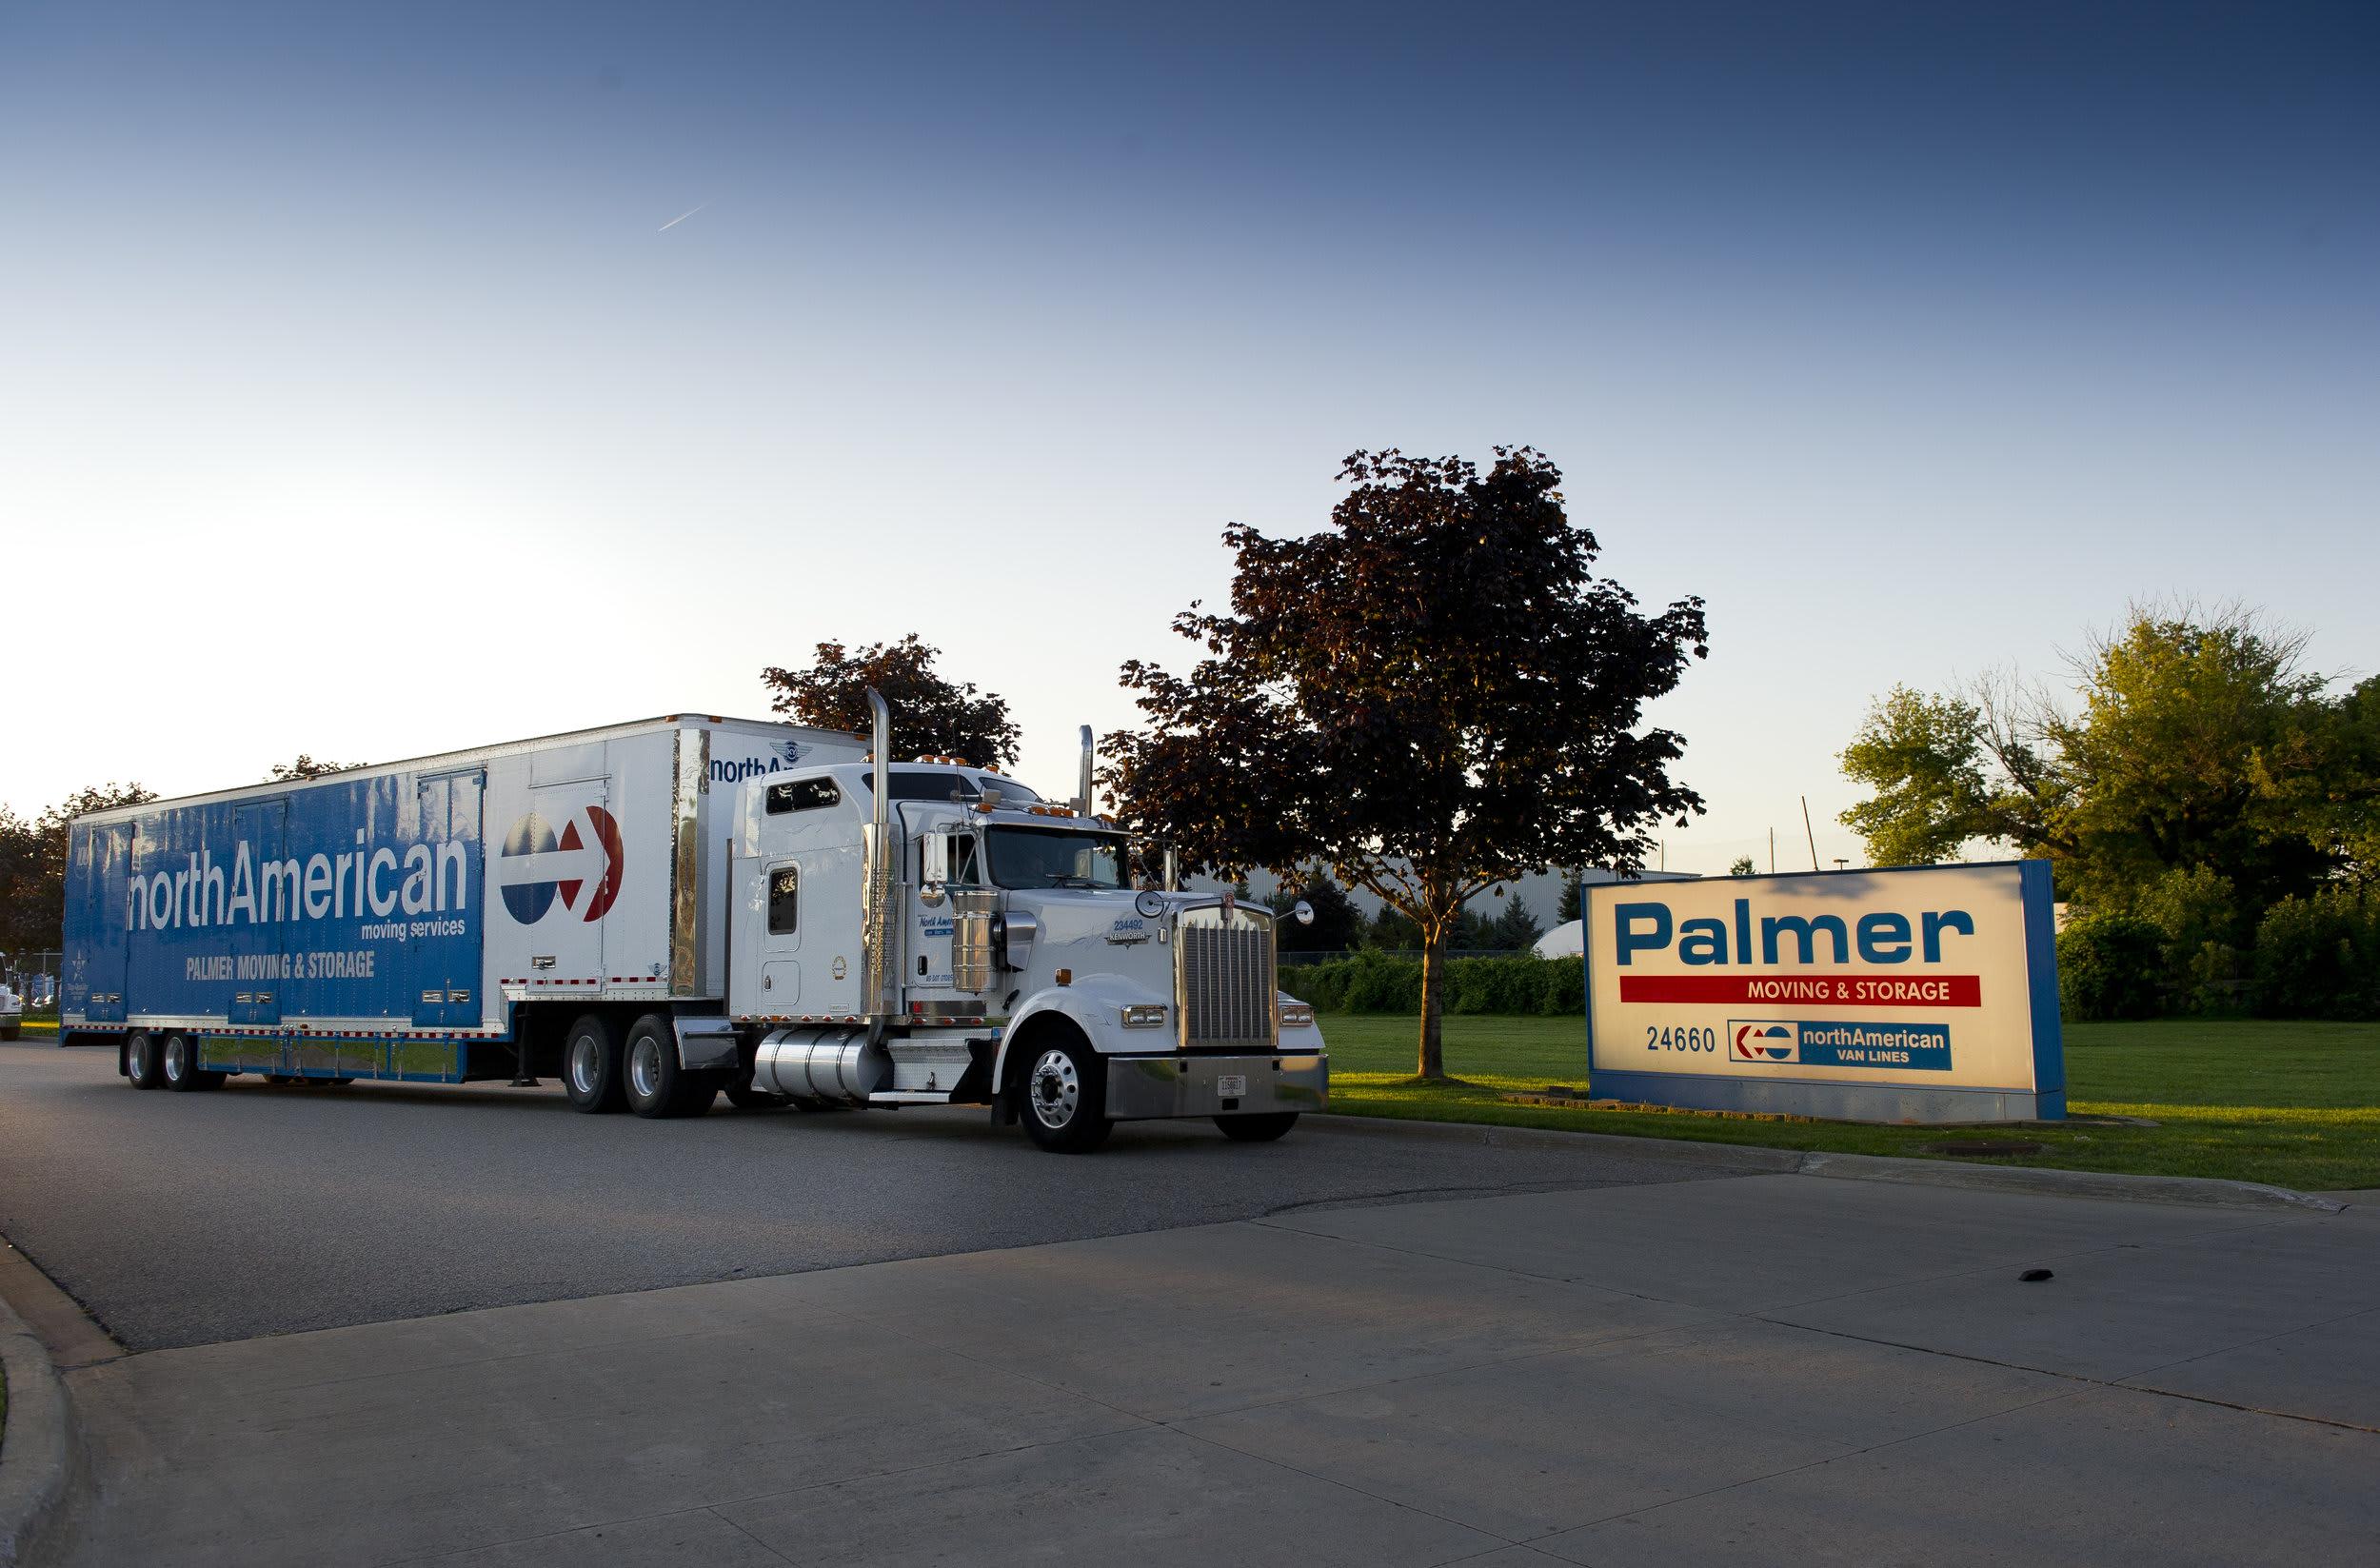 Palmer Moving & Storage: